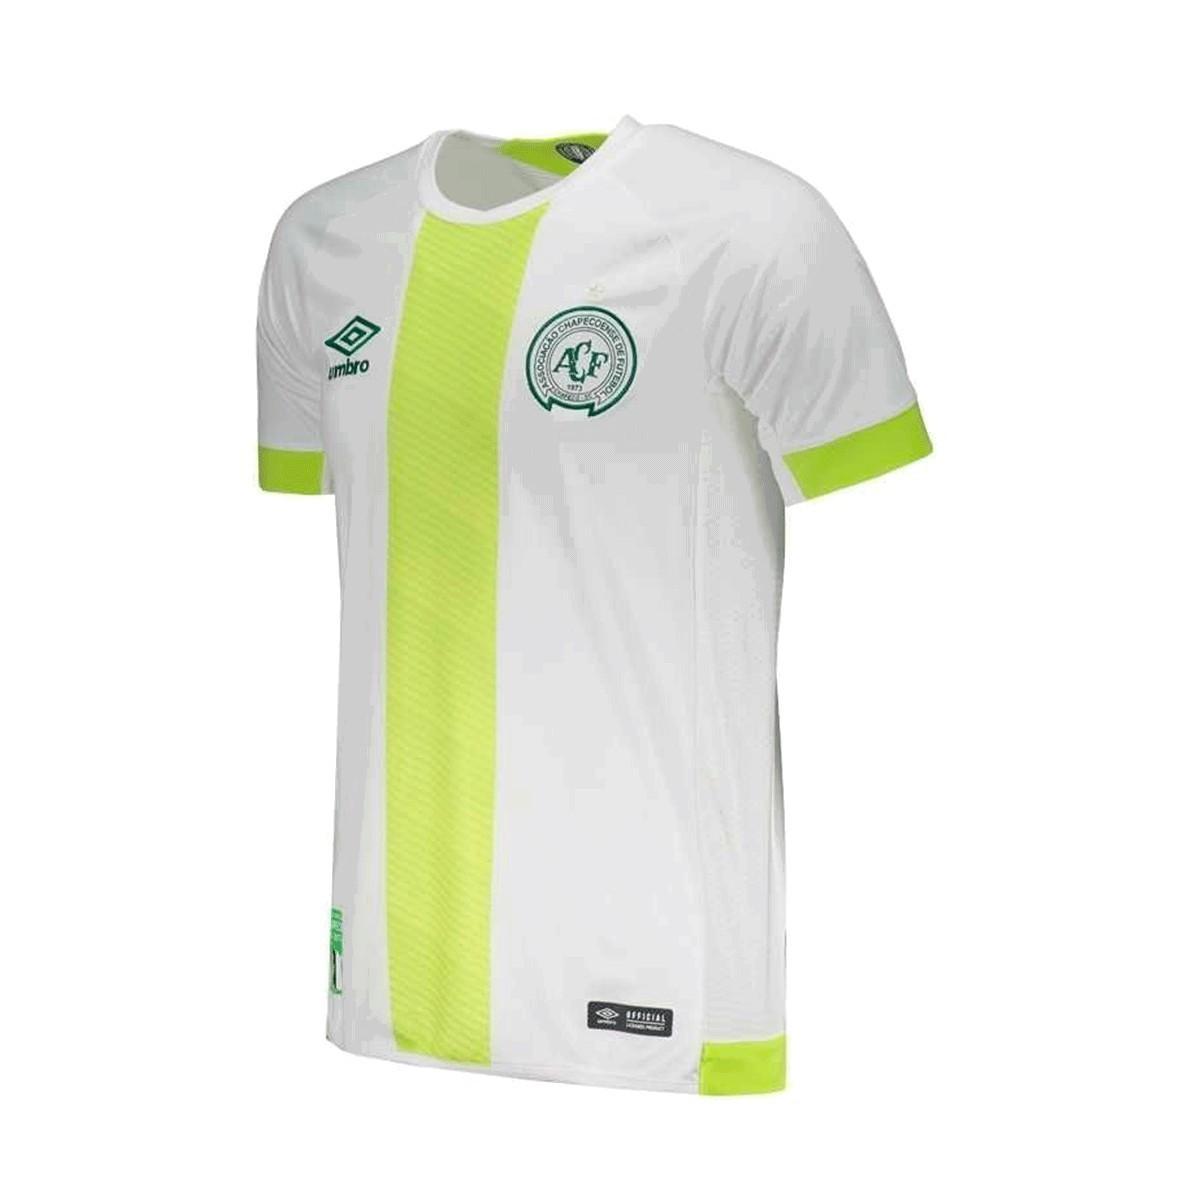 Camisa Chapecoense Umbro Away 17 18